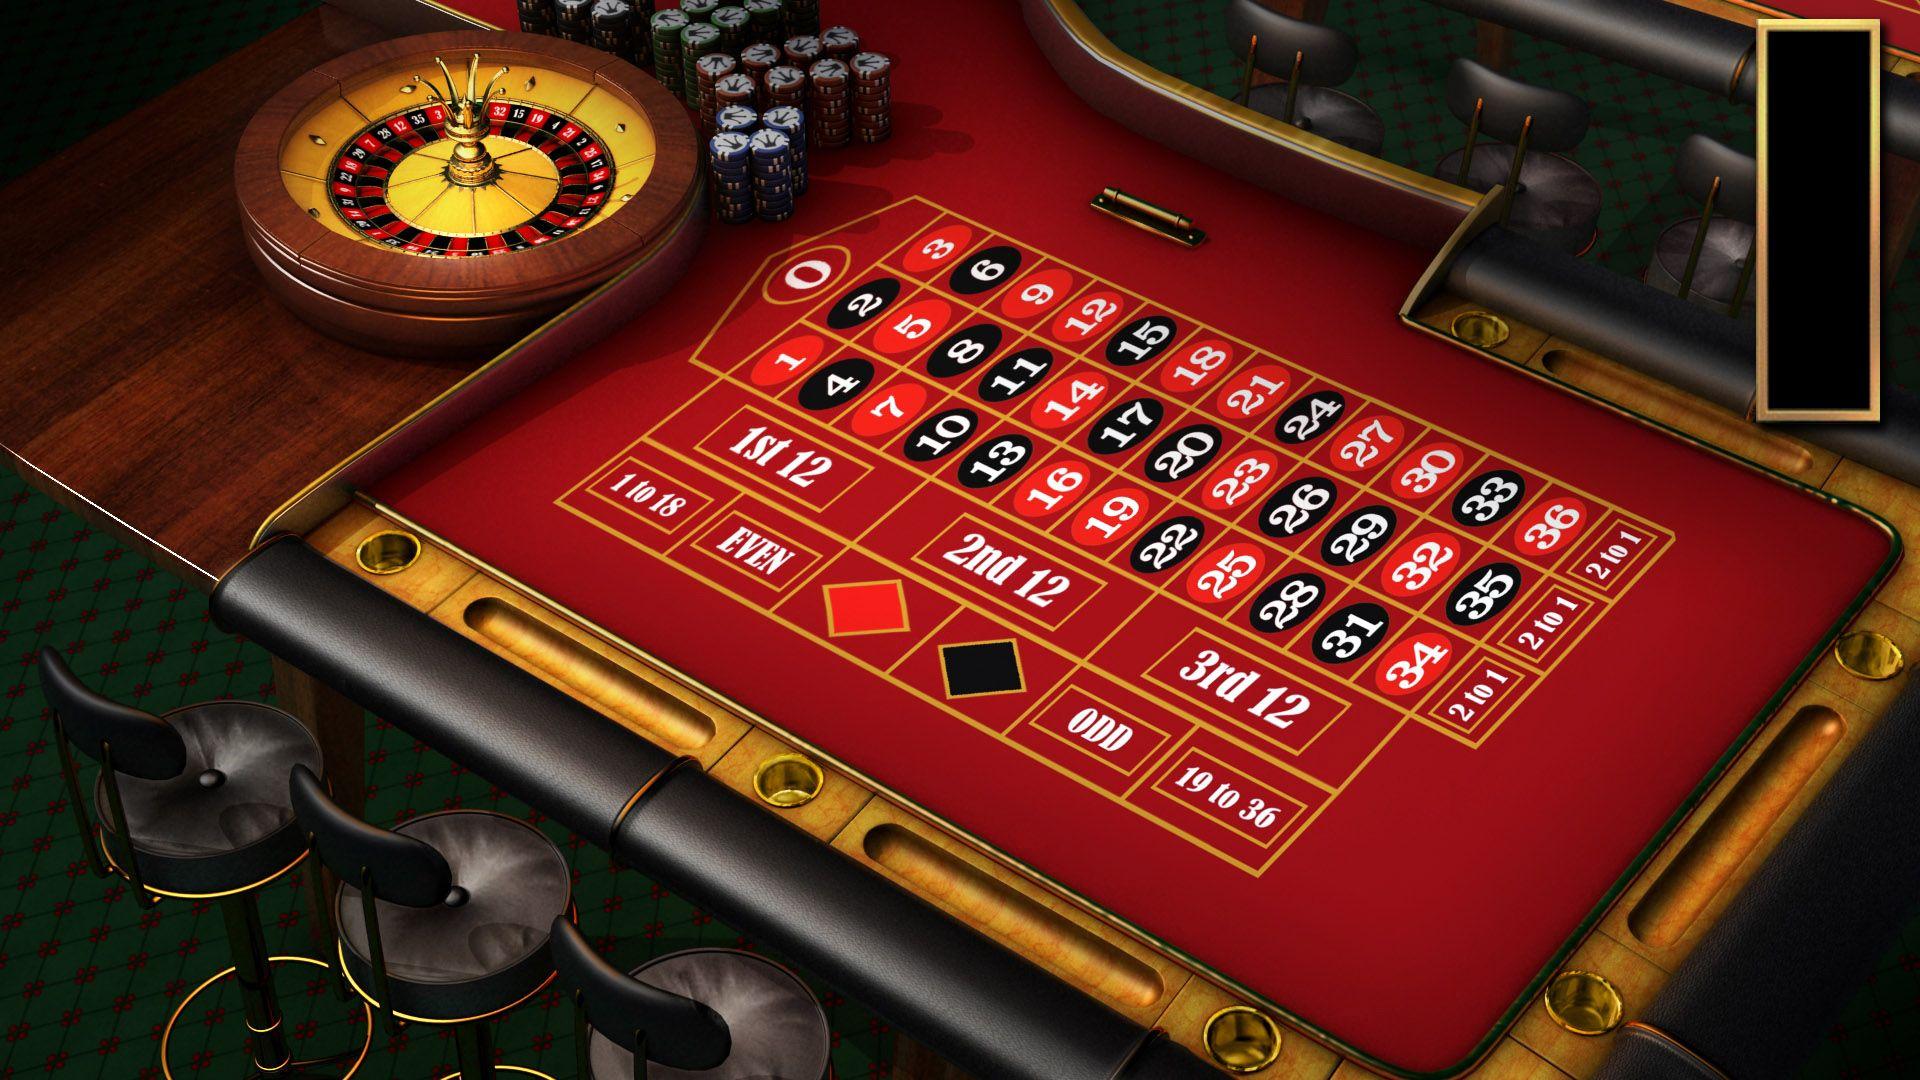 The Bandar ceme Way of Playing Internet poker